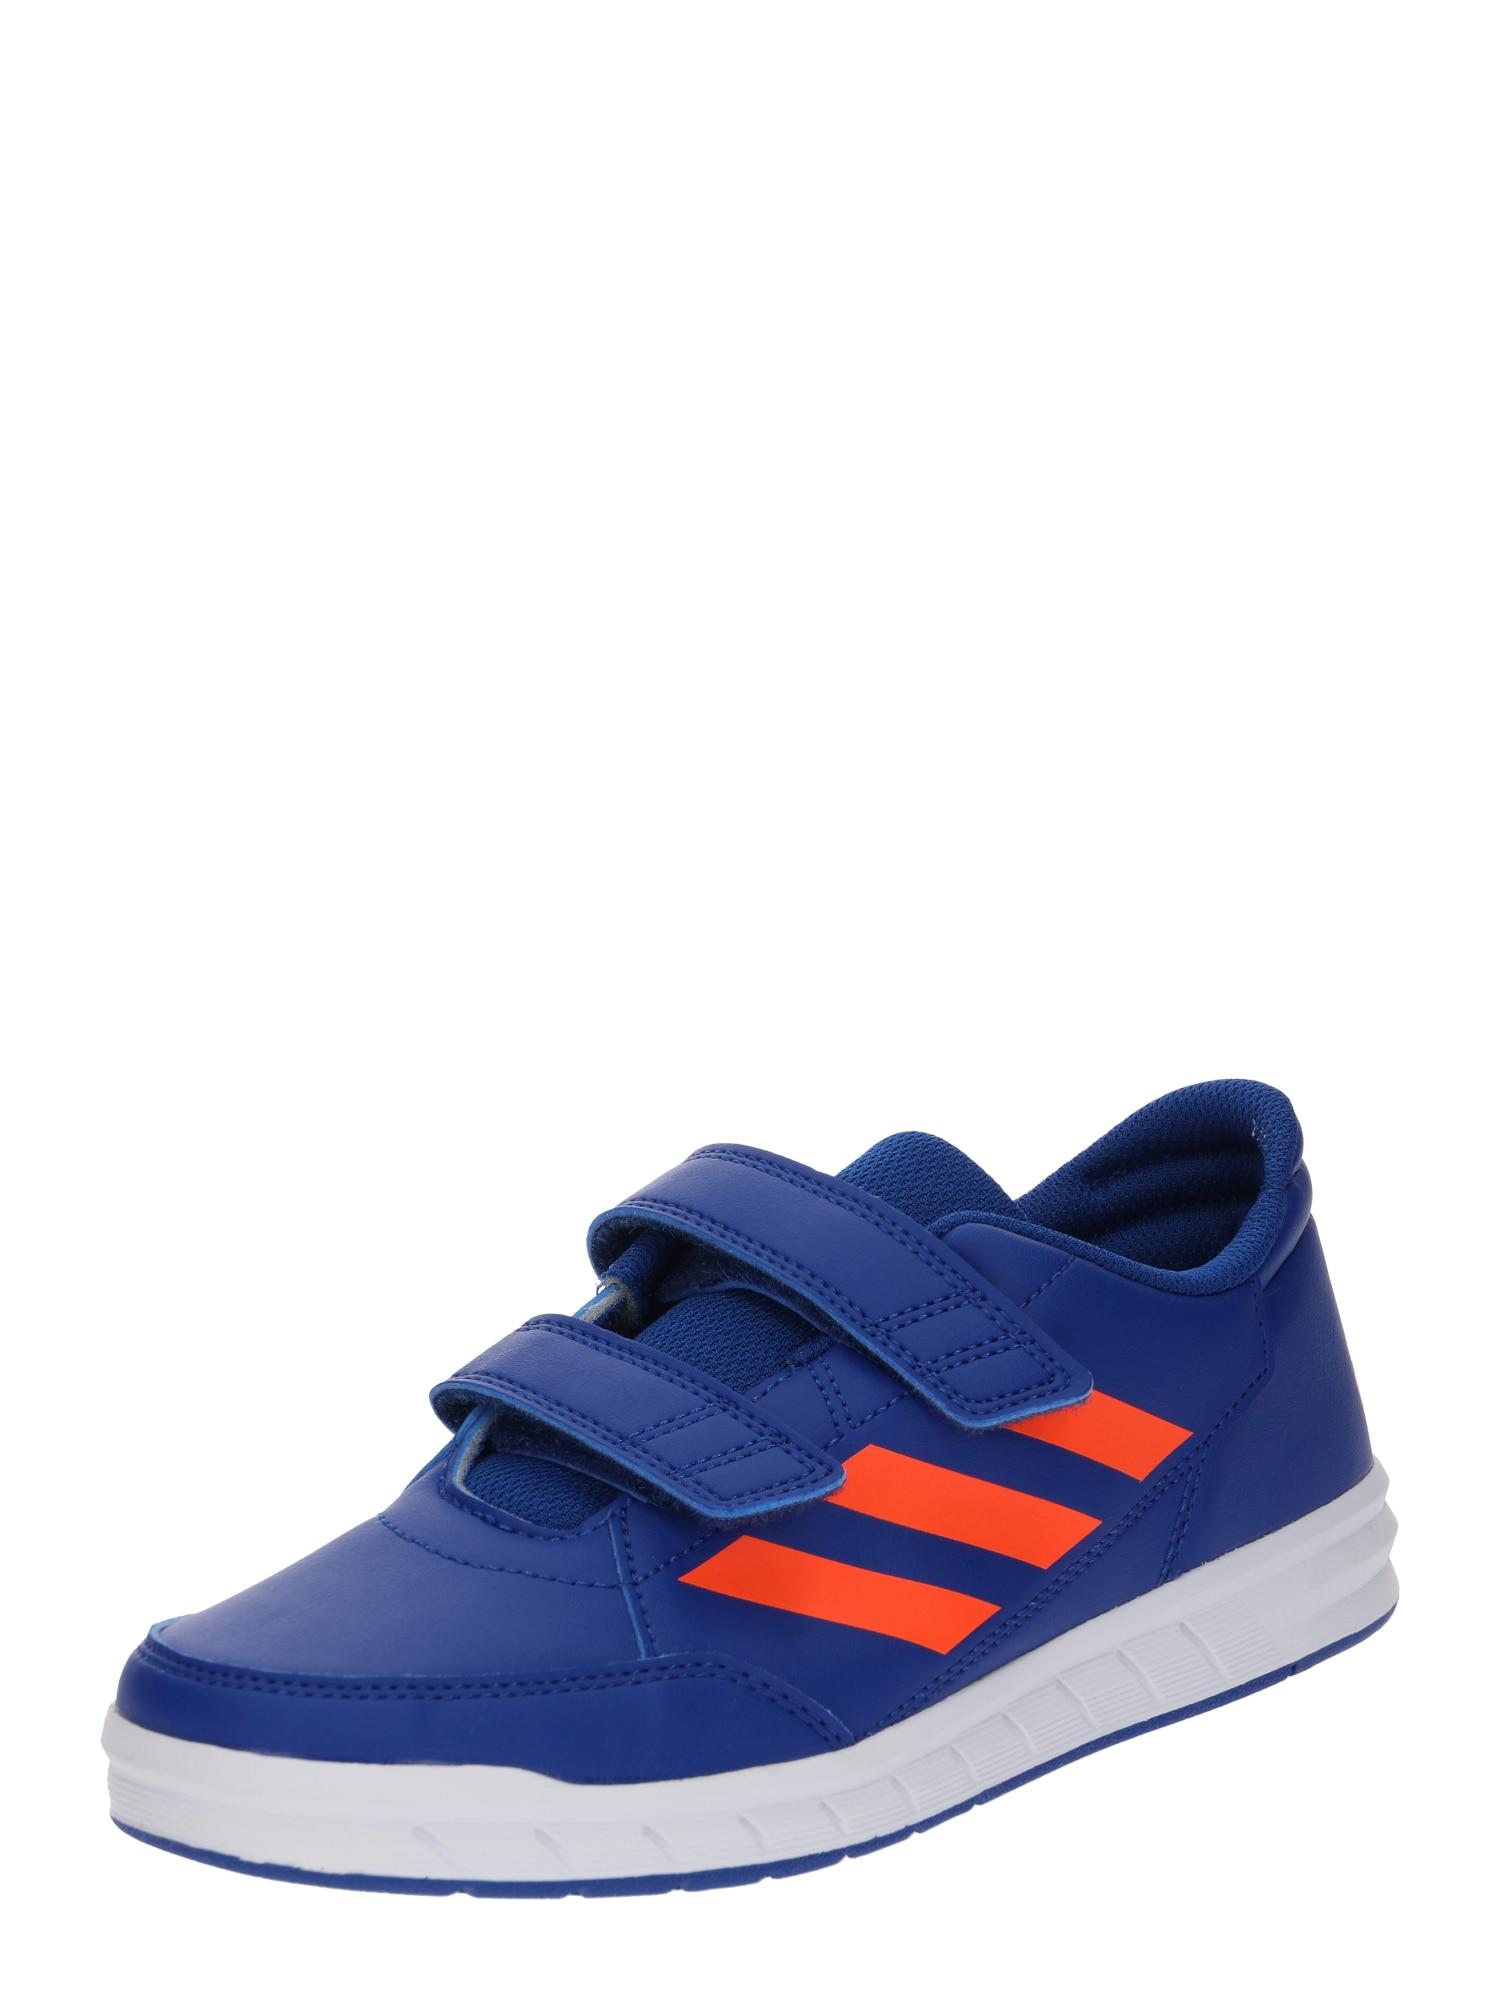 Sportovní boty AltaSport CF K modrá ADIDAS PERFORMANCE